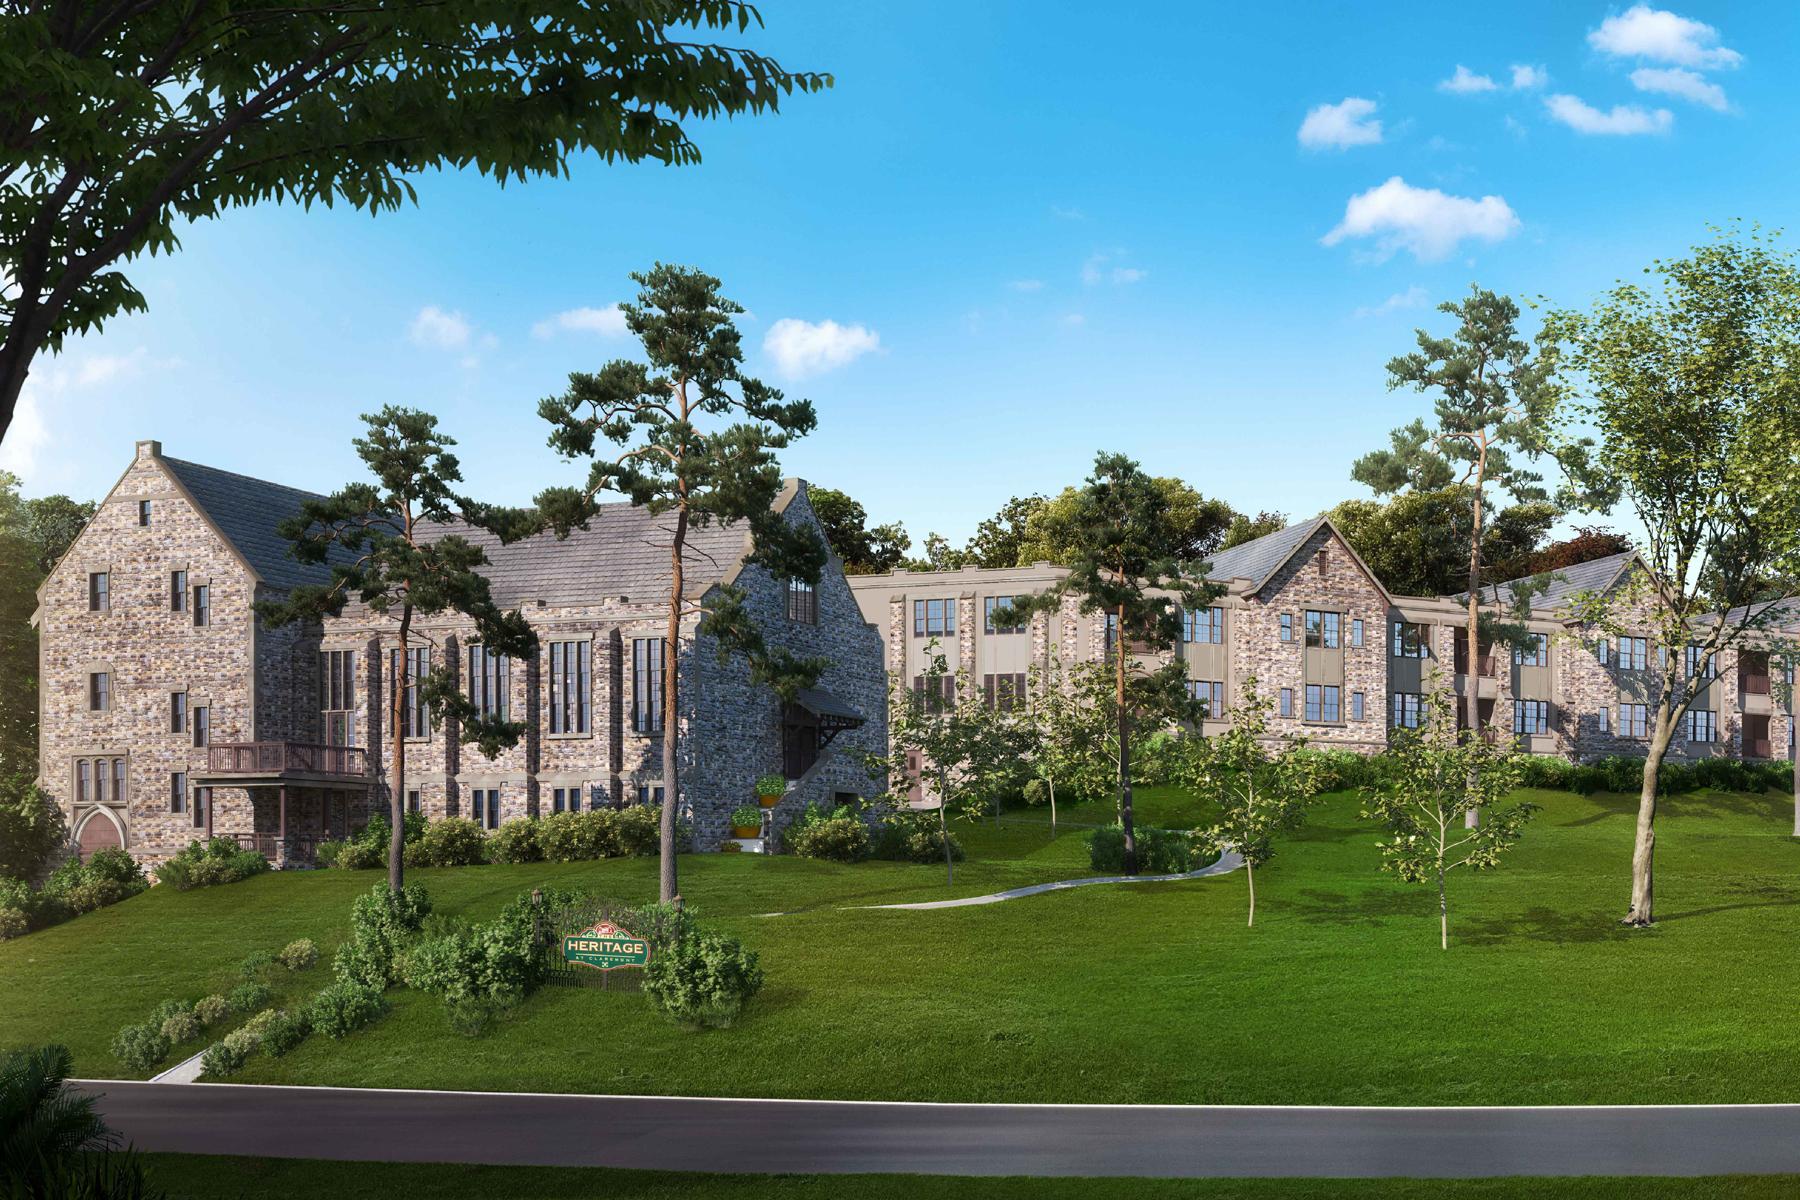 Condominiums للـ Sale في The Heritage at Claremont 80 Claremont Road, Residence 802, Bernardsville, New Jersey 07924 United States